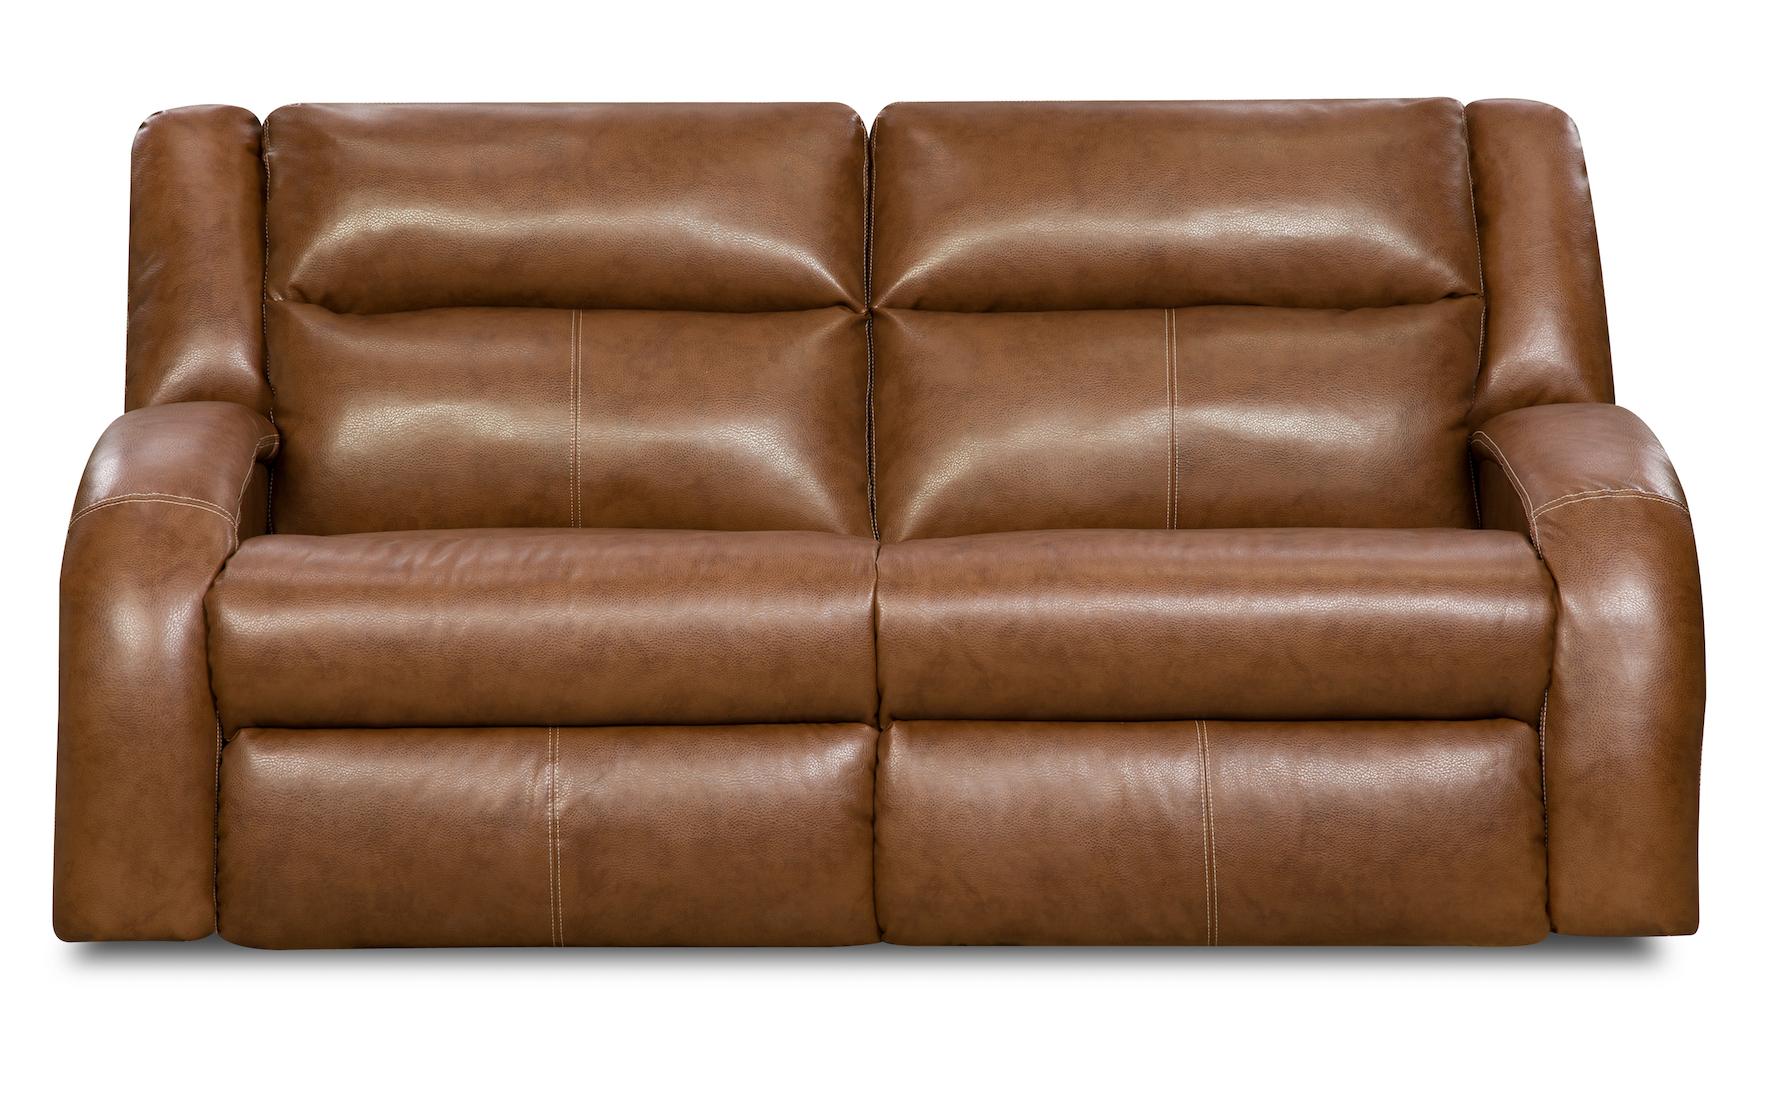 Super Maverick 550 Dual Two Seat Reclining Sofa Sofas And Uwap Interior Chair Design Uwaporg